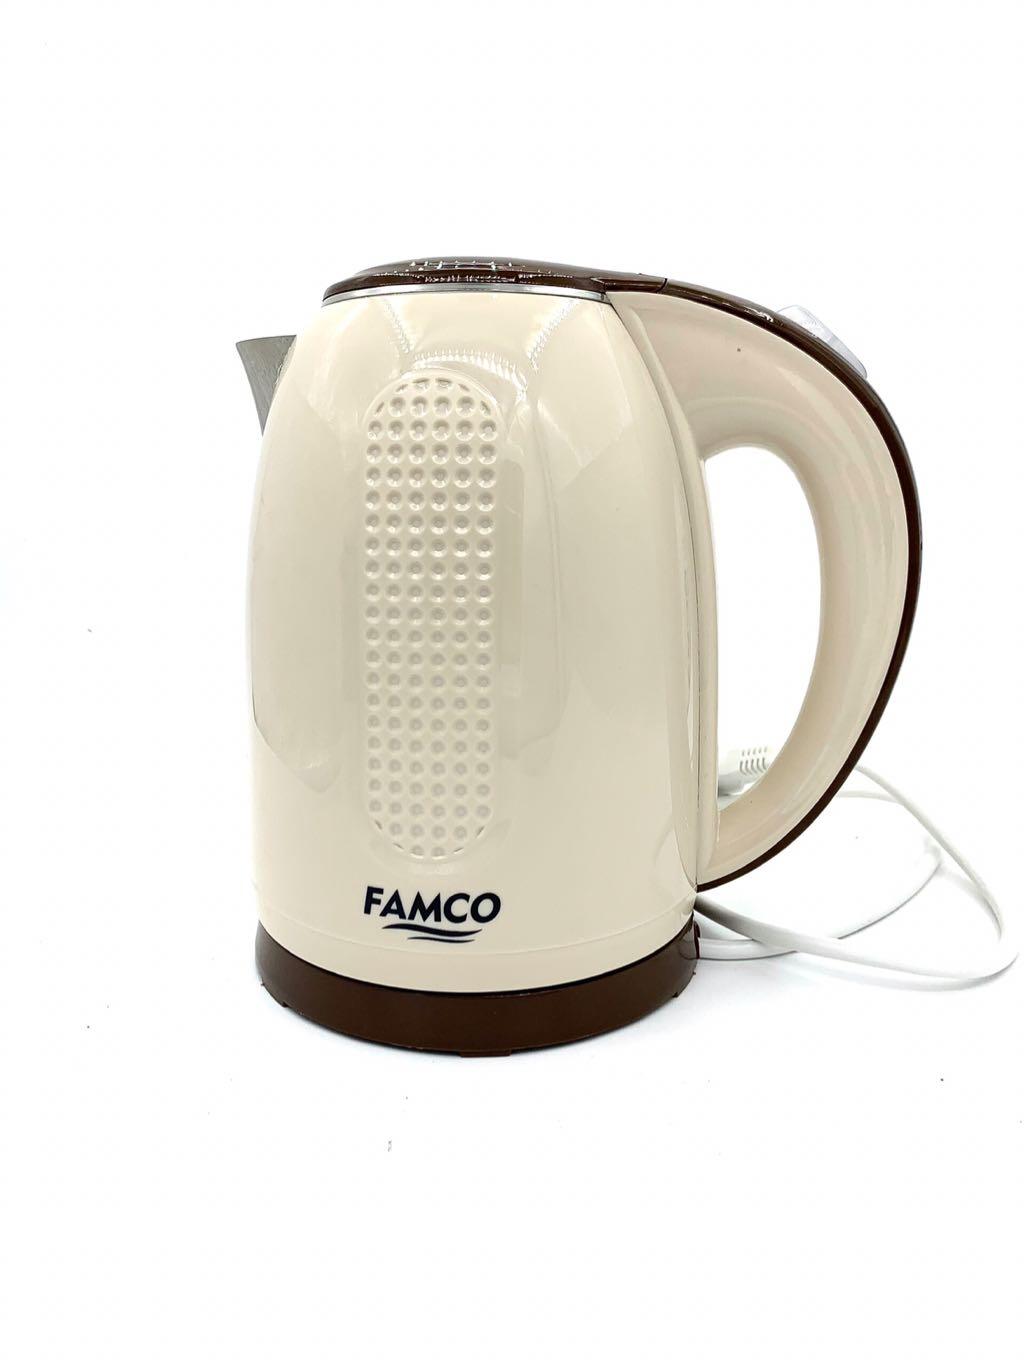 Ấm siêu tốc Famco 9640FC 1,7L